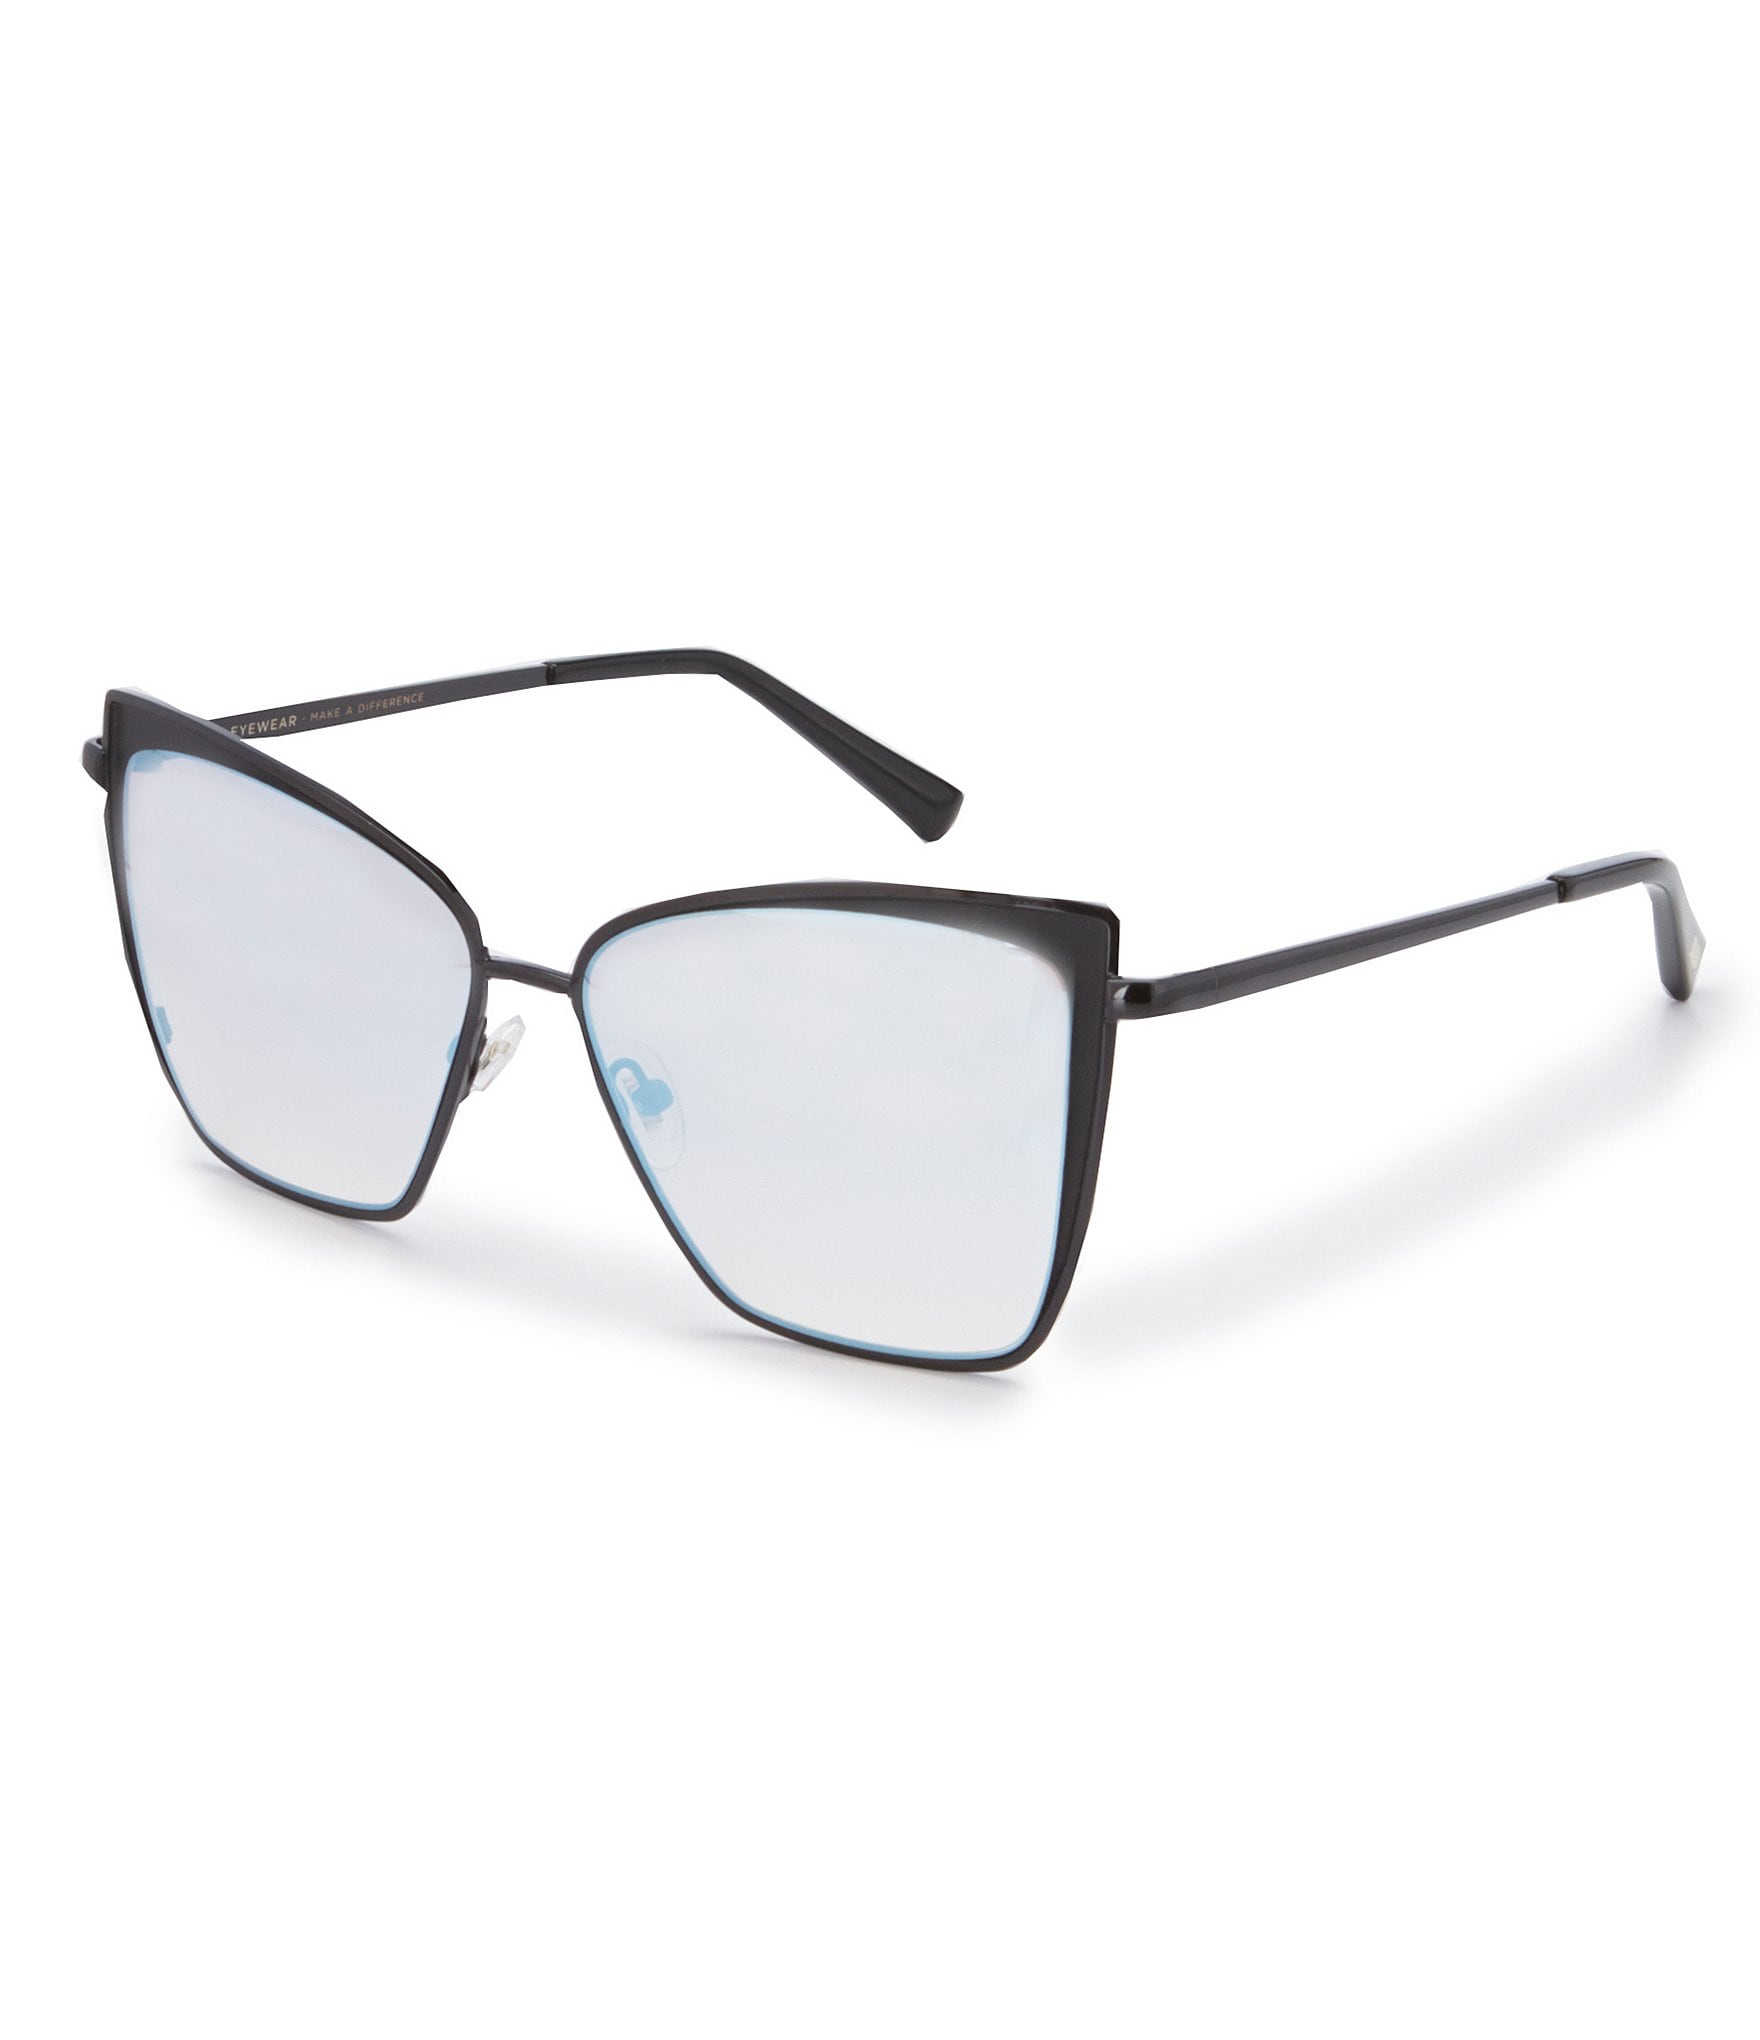 Diff Eyewear Becky Black Flash Grey Gradient Polarized Cat Eye Sunglasses Dillard S